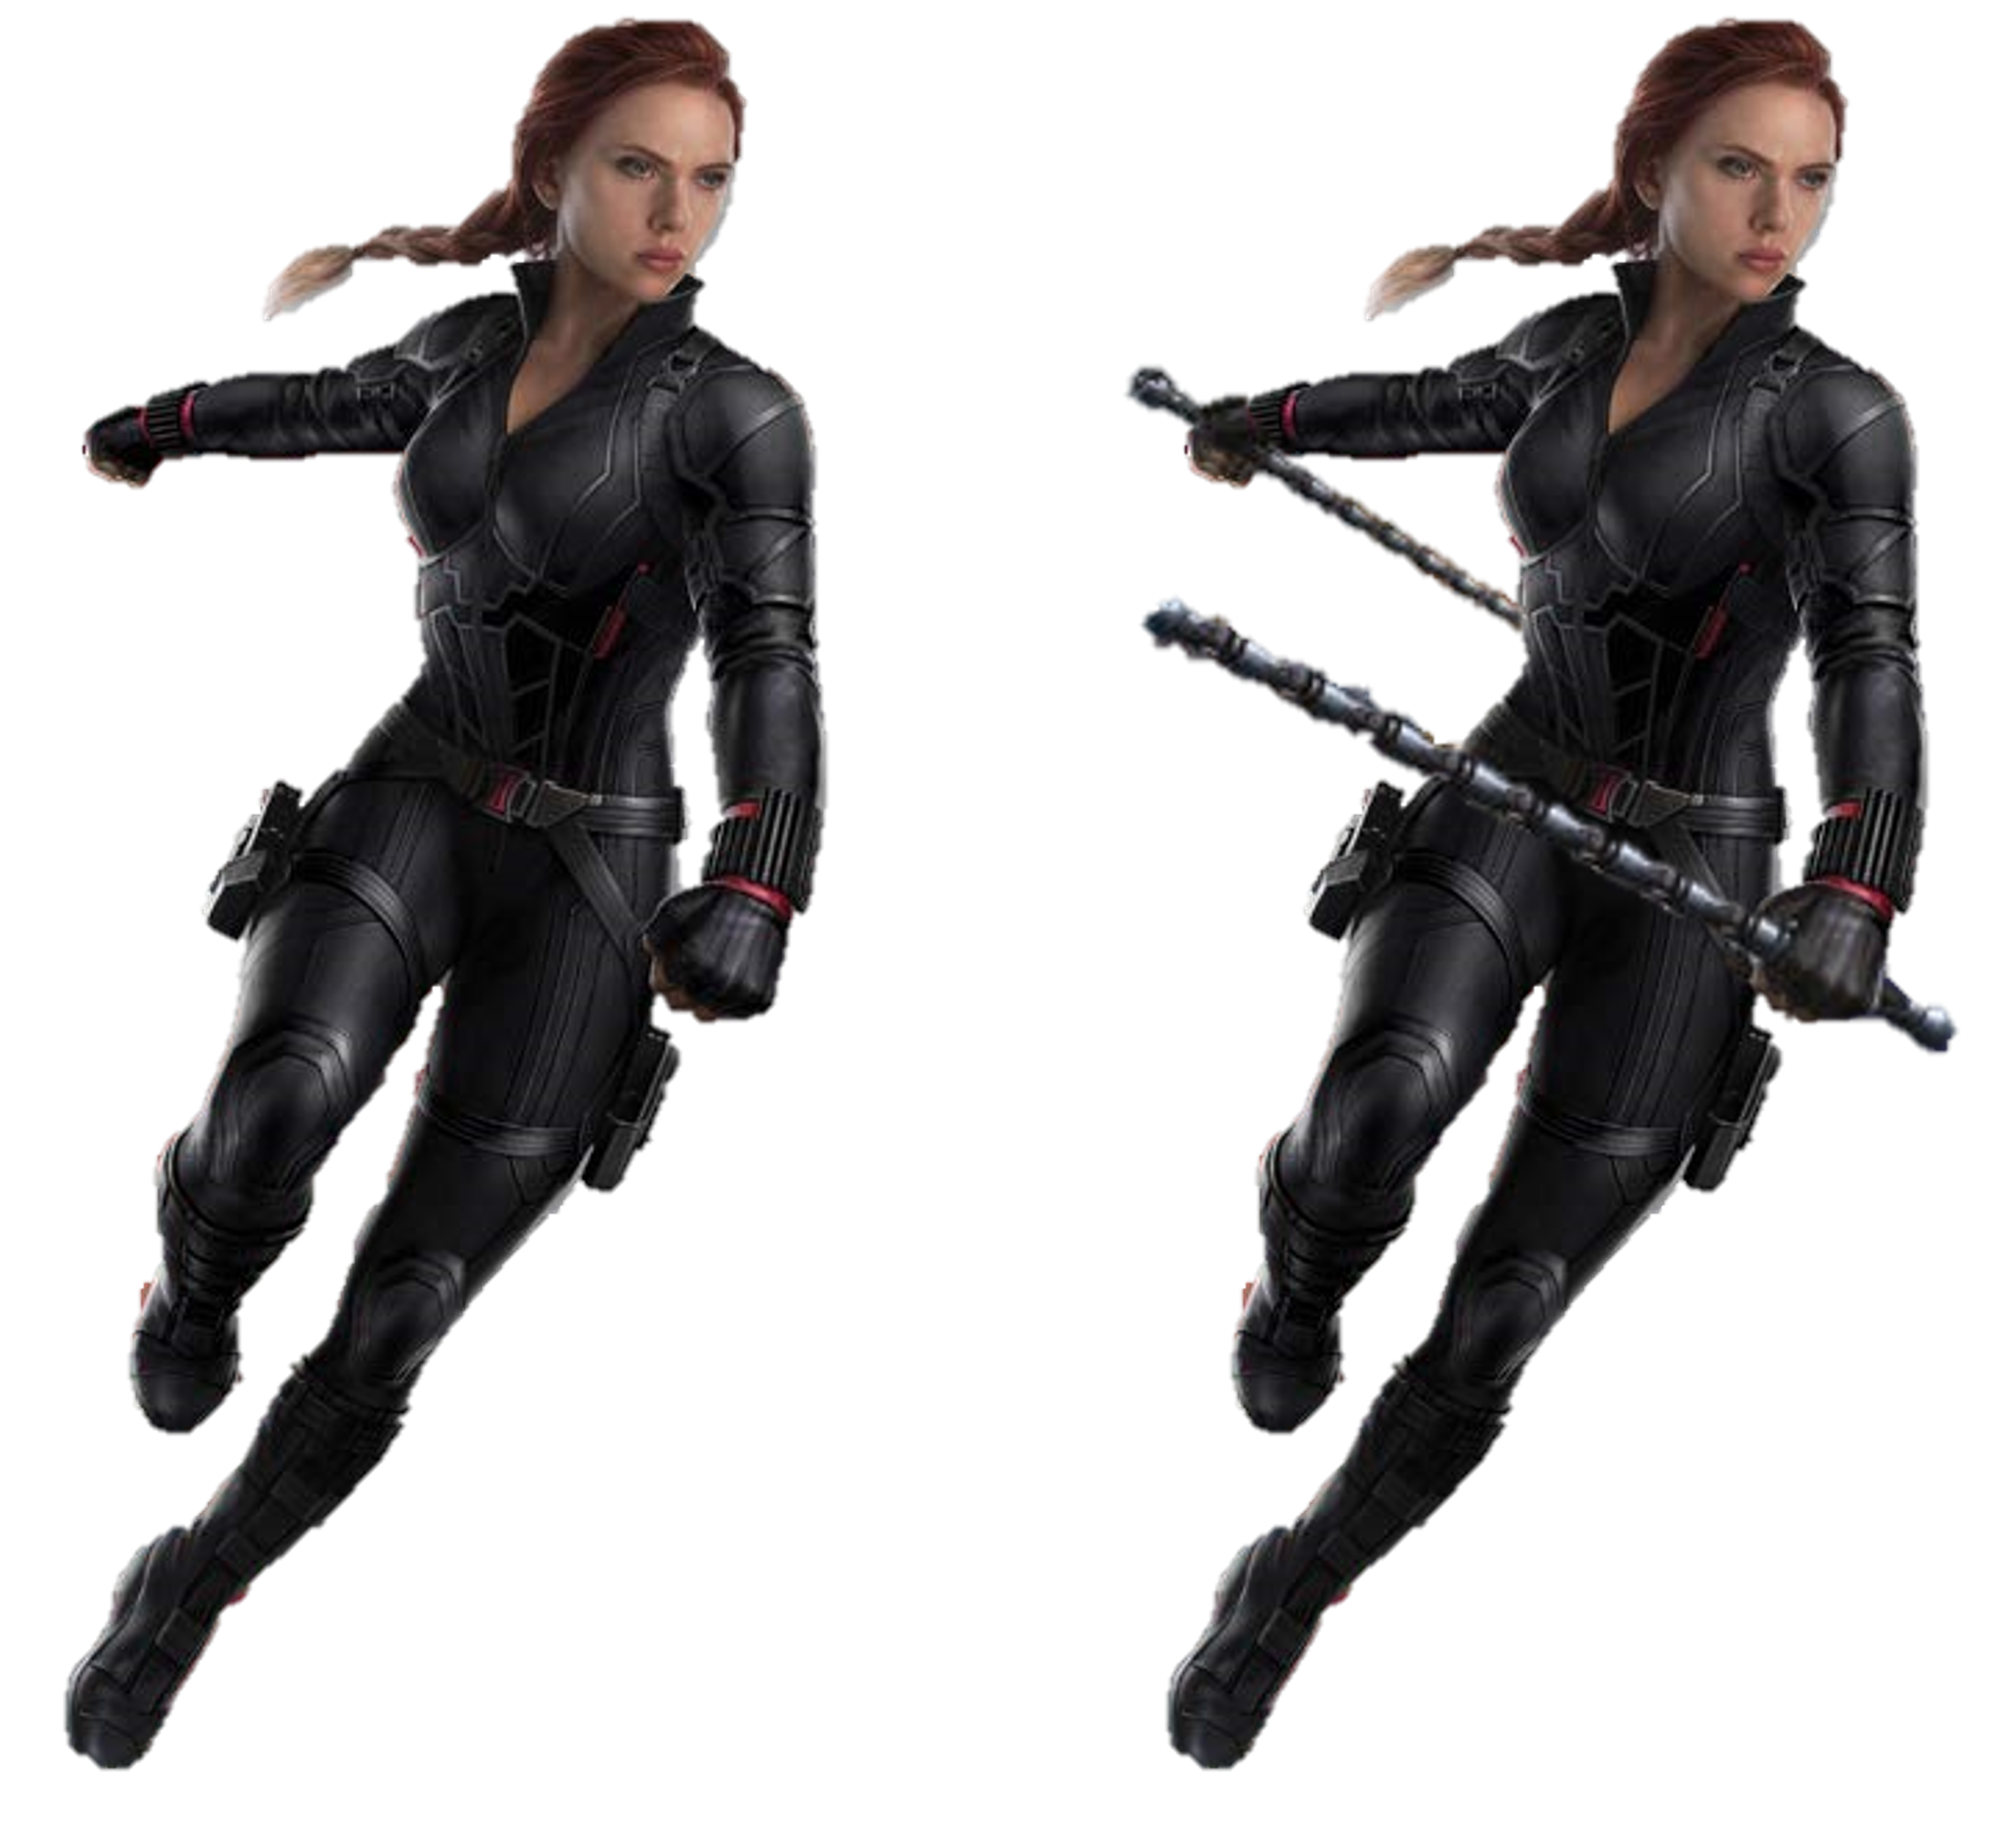 Avengers Endgame Black Widow 2 Png By Captain Kingsman16 On Deviantart